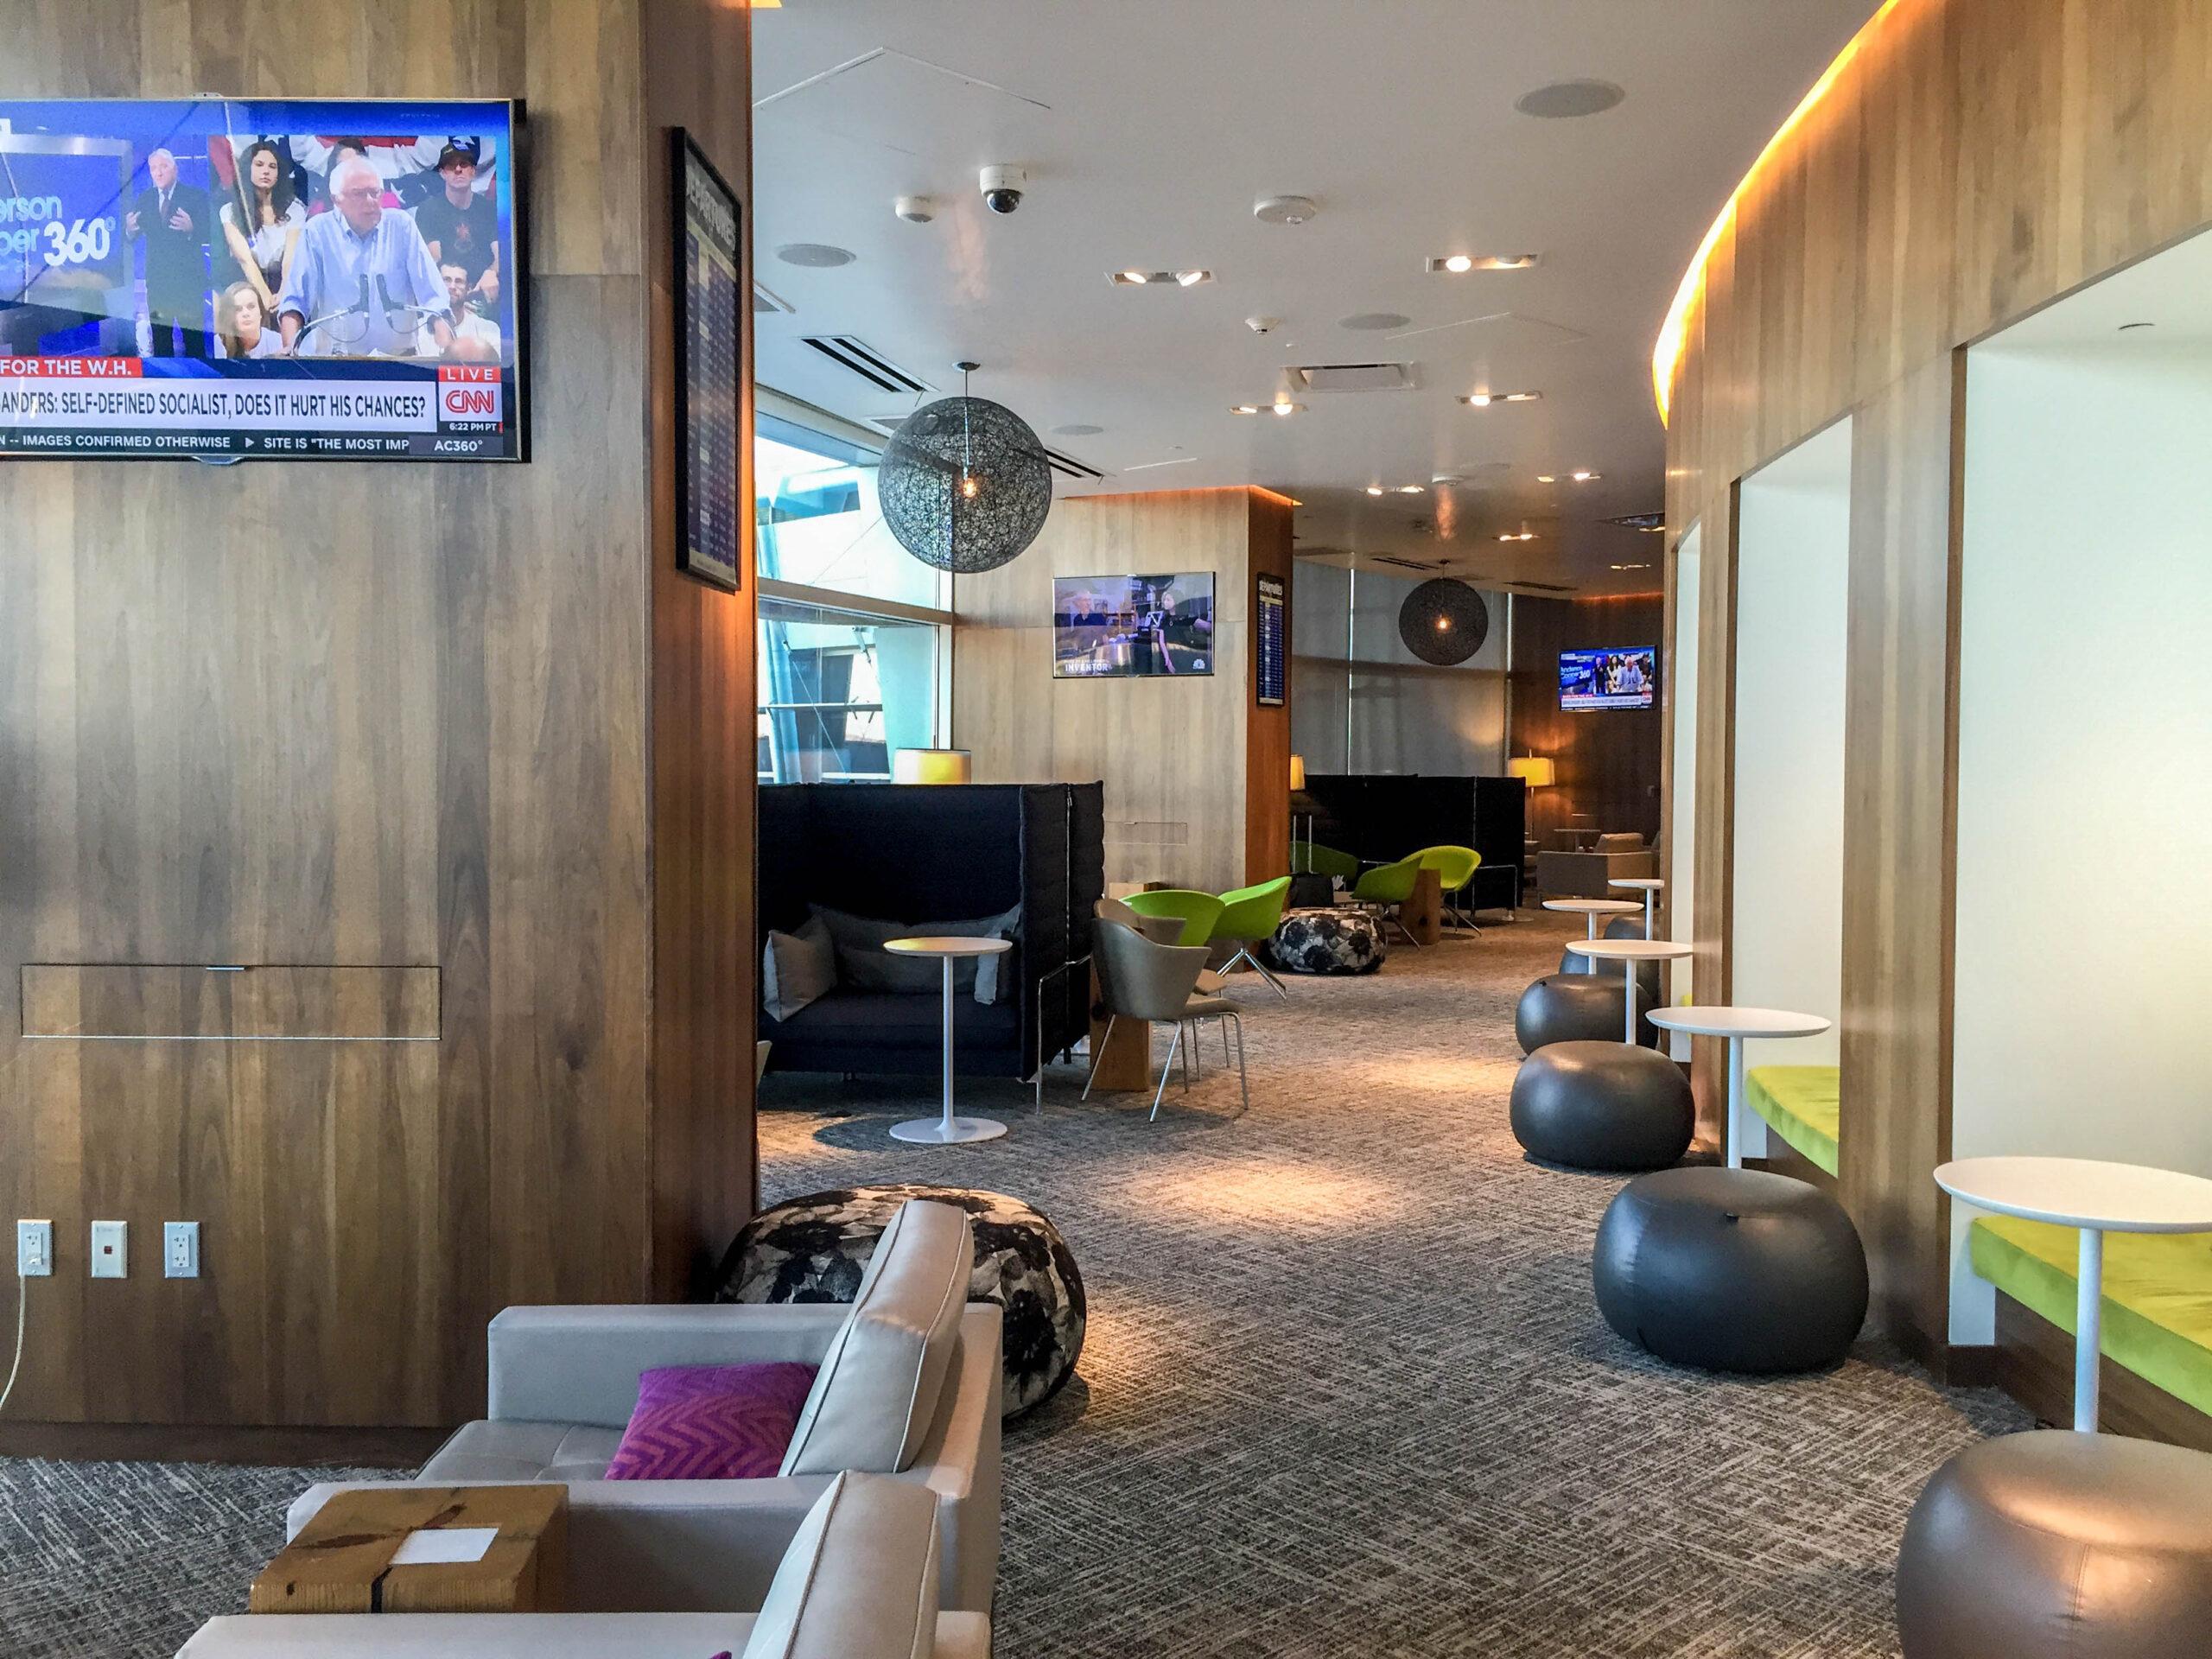 Centurion Lounge At LAS Vegas Airport